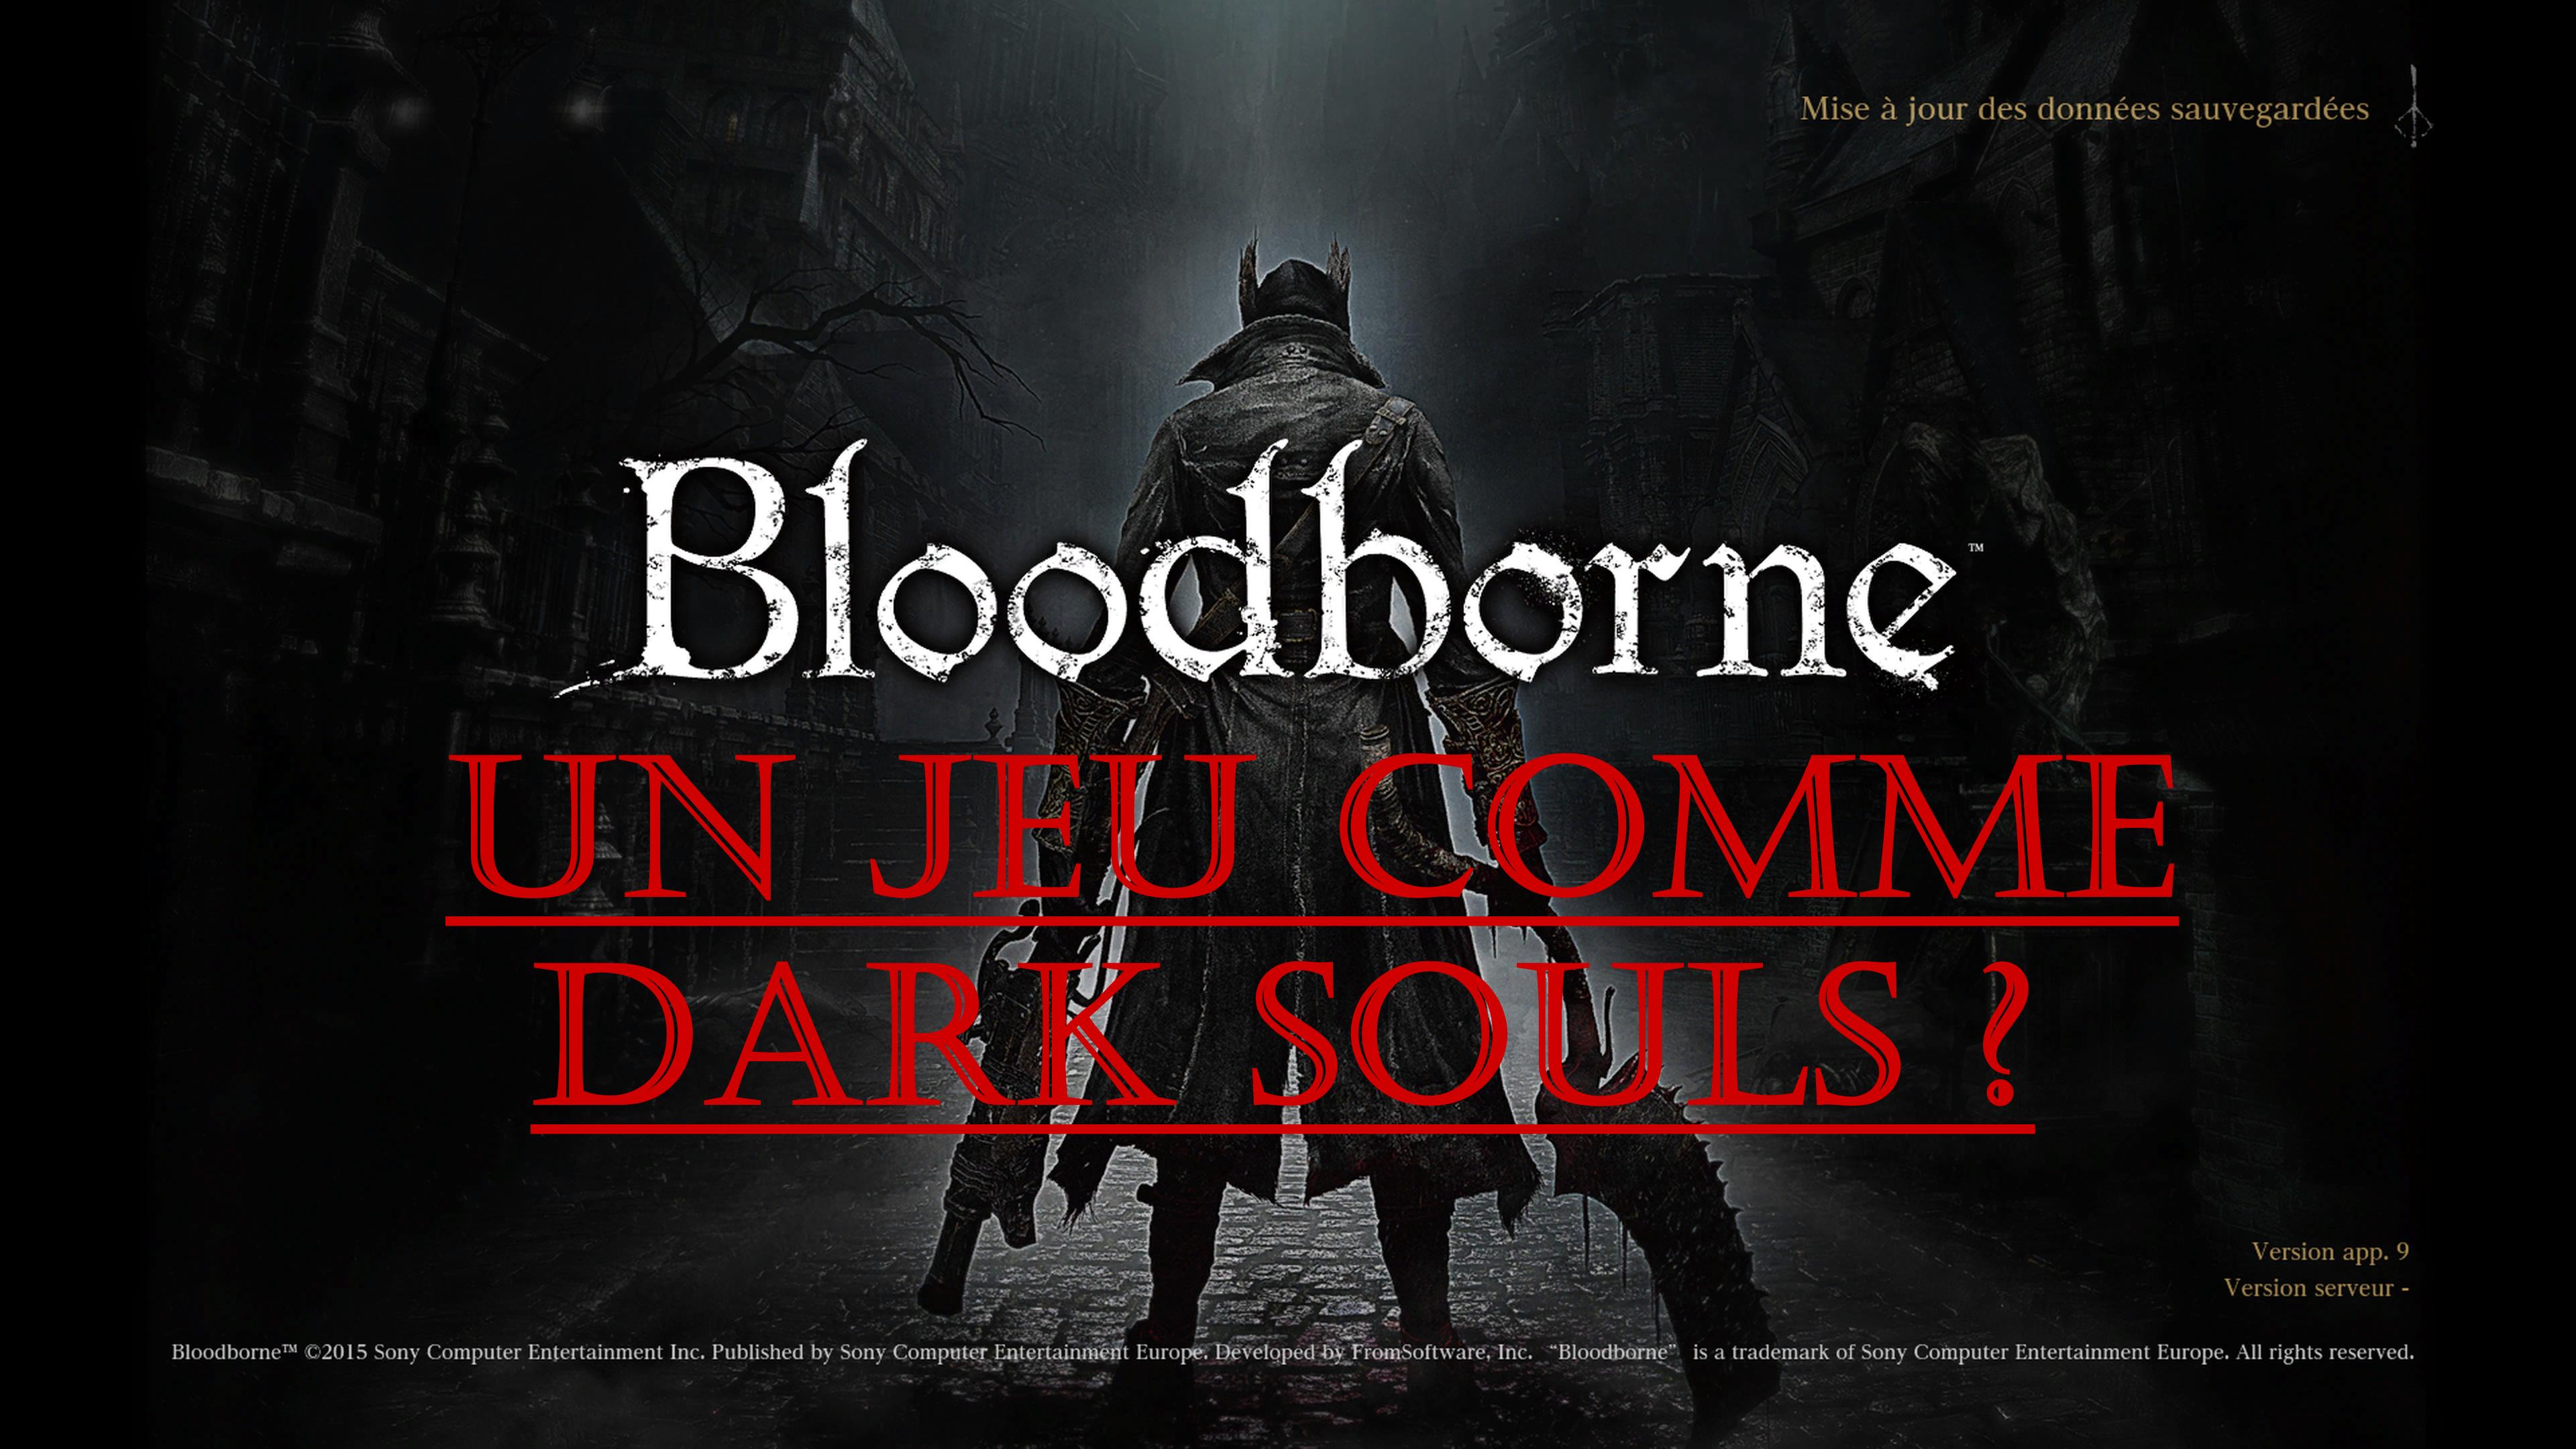 Dark Souls est-il le Dark Souls des Dark Souls ?